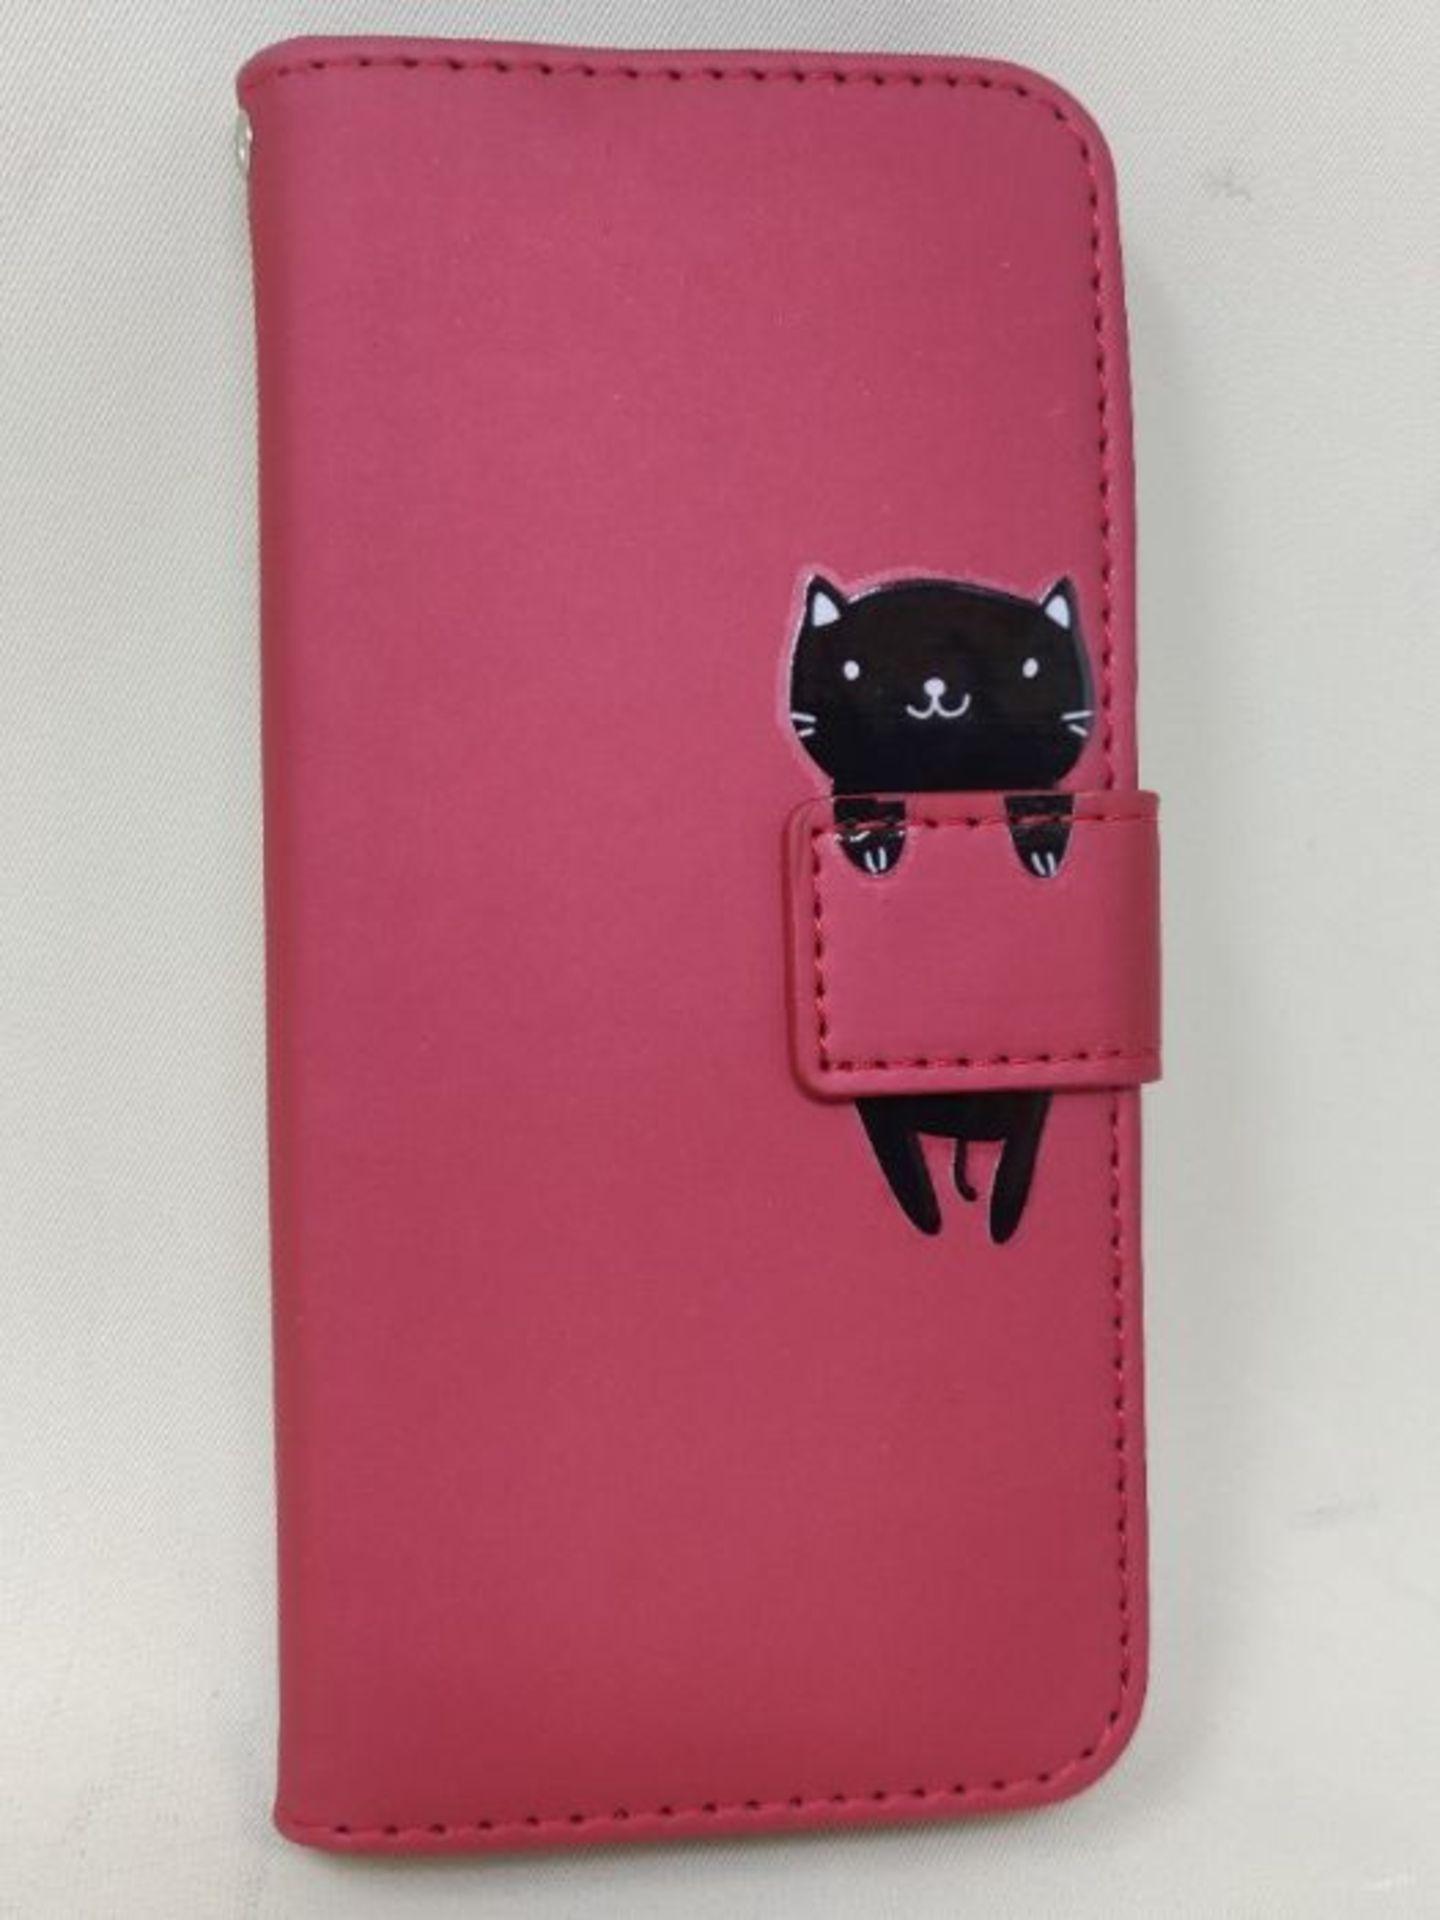 Ailisi Galaxy A20e Case, Cute Cartoon Animal Leather Wallet flip case Creative magneti - Image 2 of 2